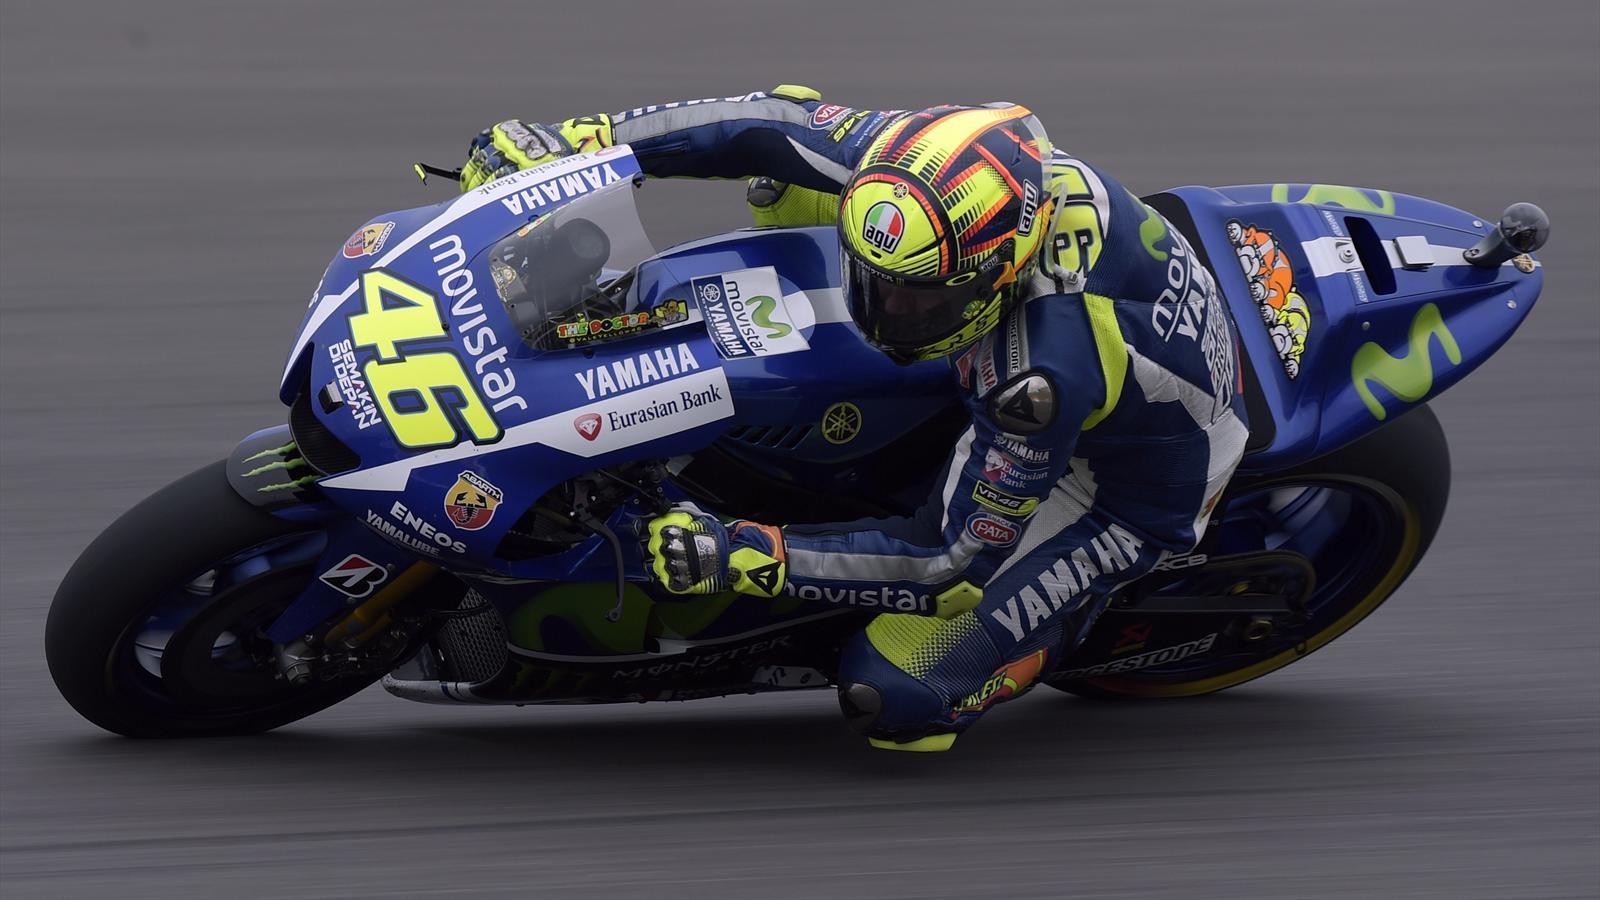 Grand Prix MotoGP d'Italie en direct streaming ce dimanche 31 Mai 2015